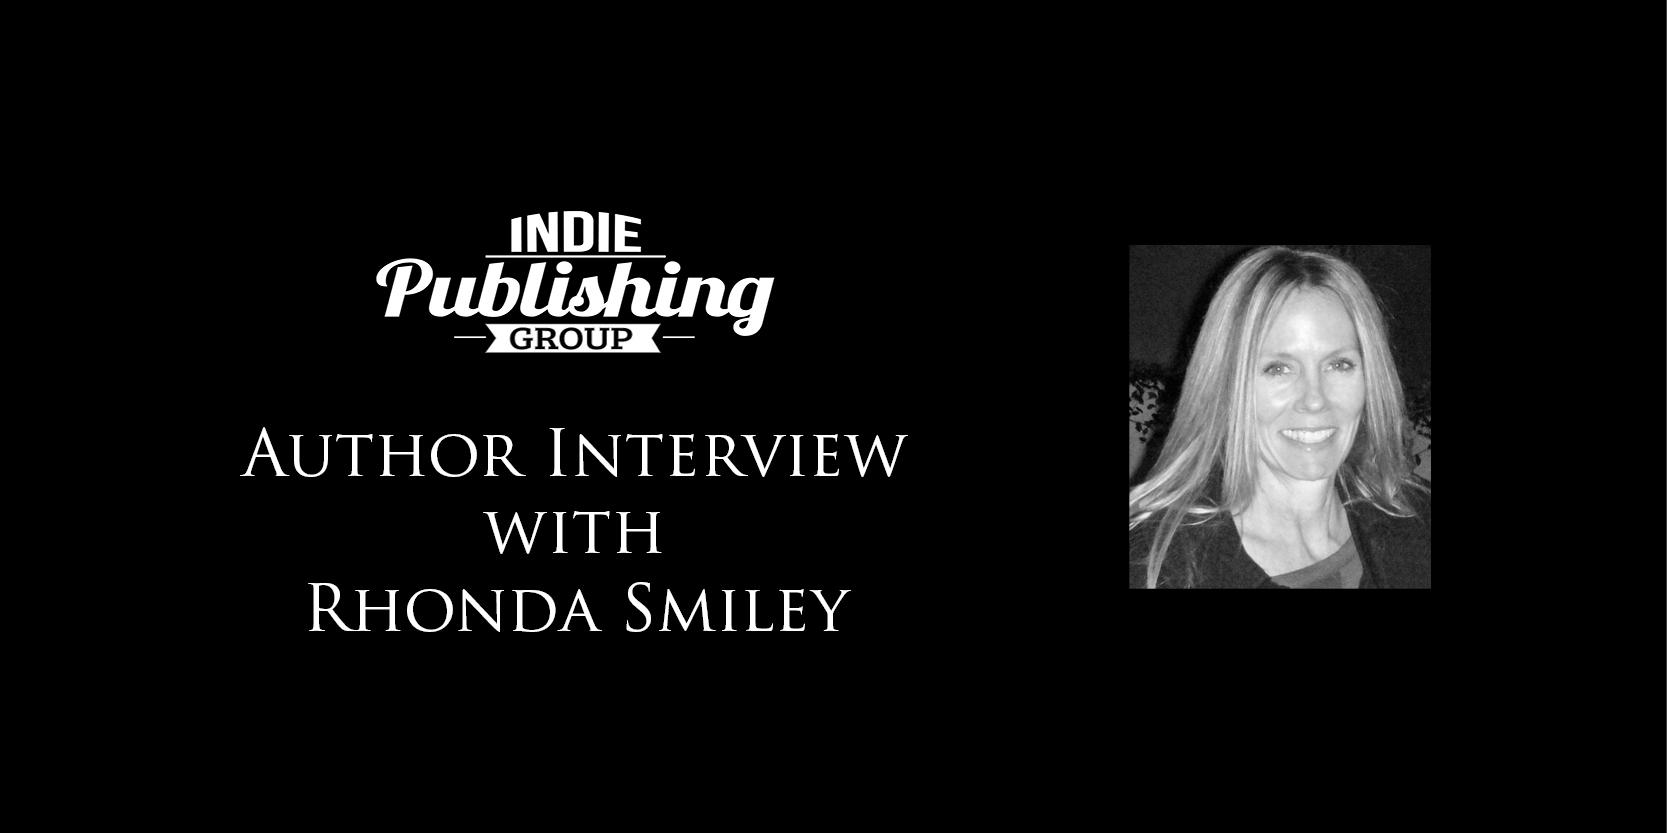 Author Interview Rhonda Smiley